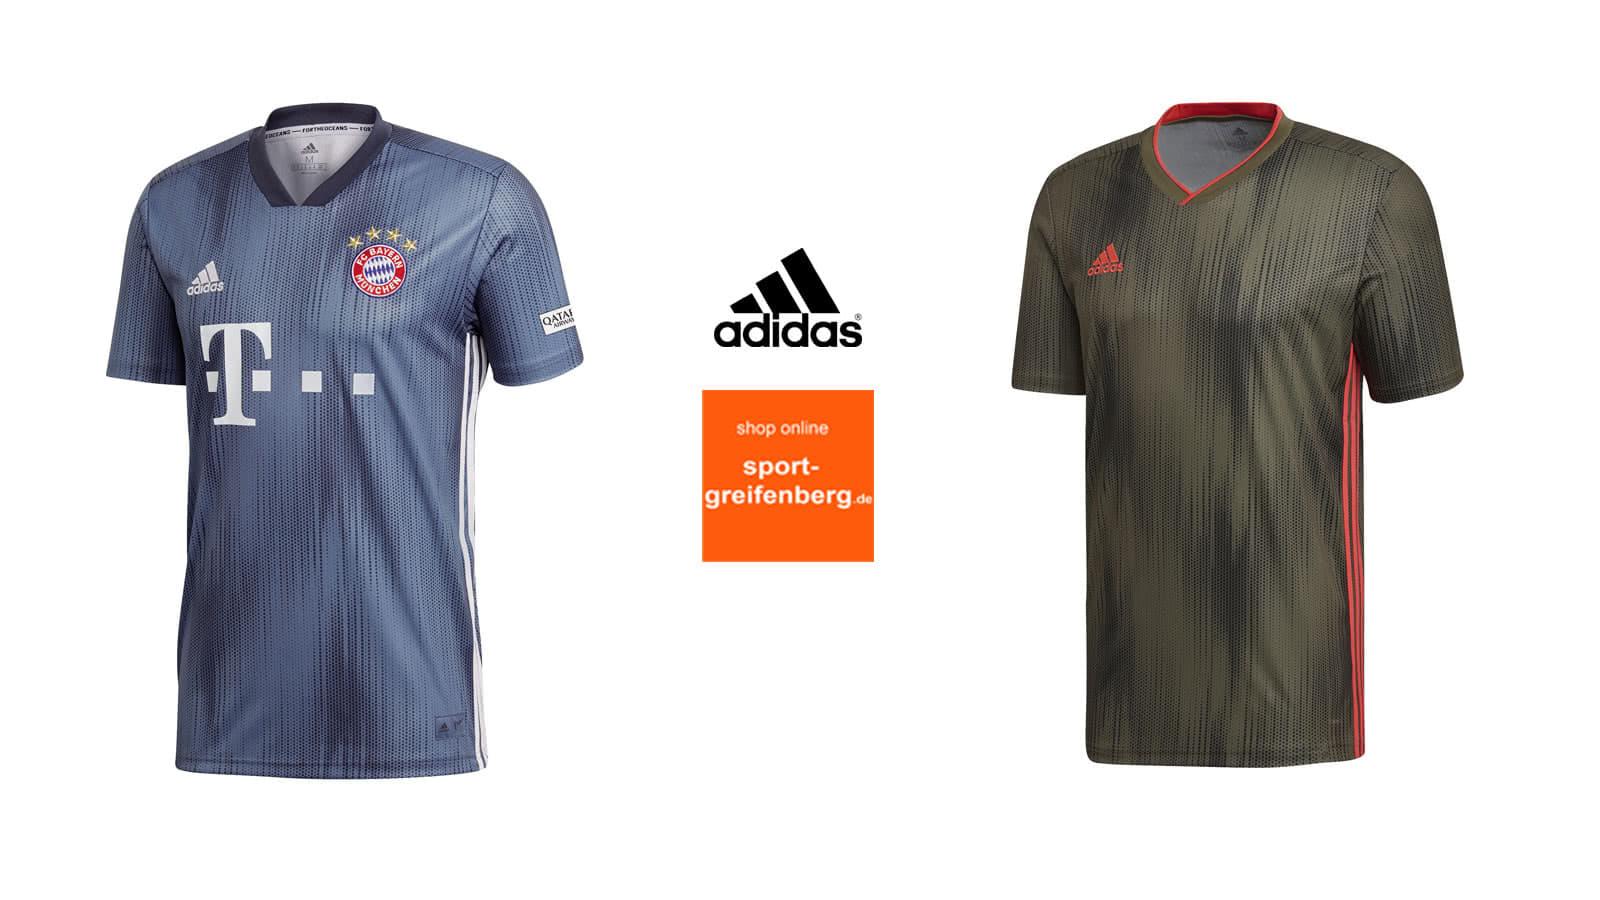 adidas Tiro 19 Jersey = Trikot von Bayern, Manu und Juve ?